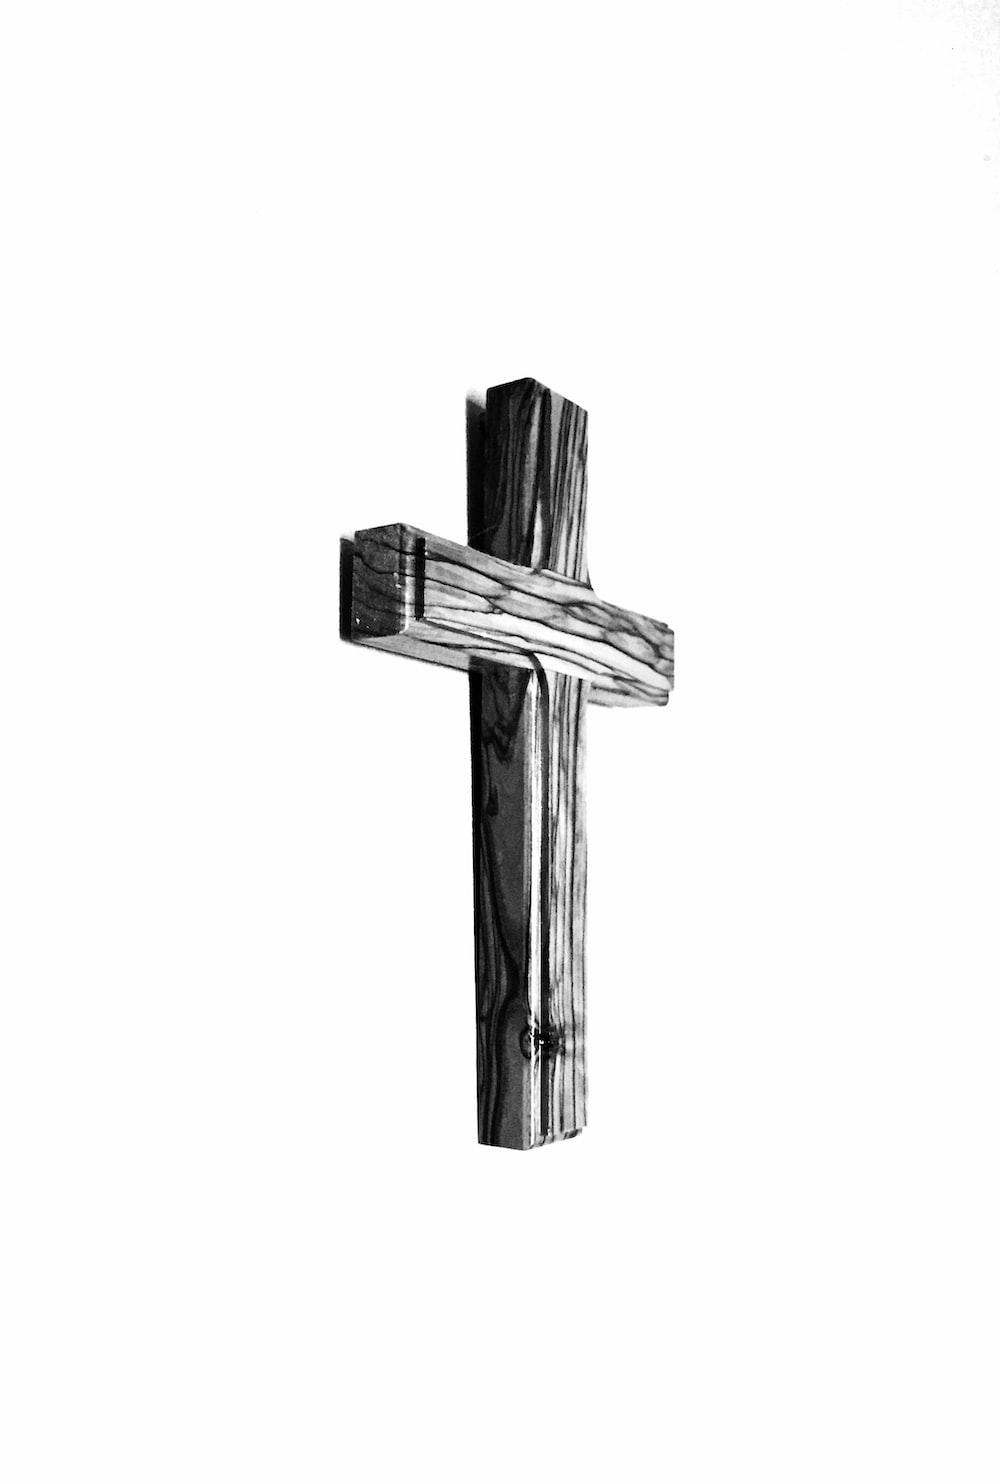 wooden cross illustration